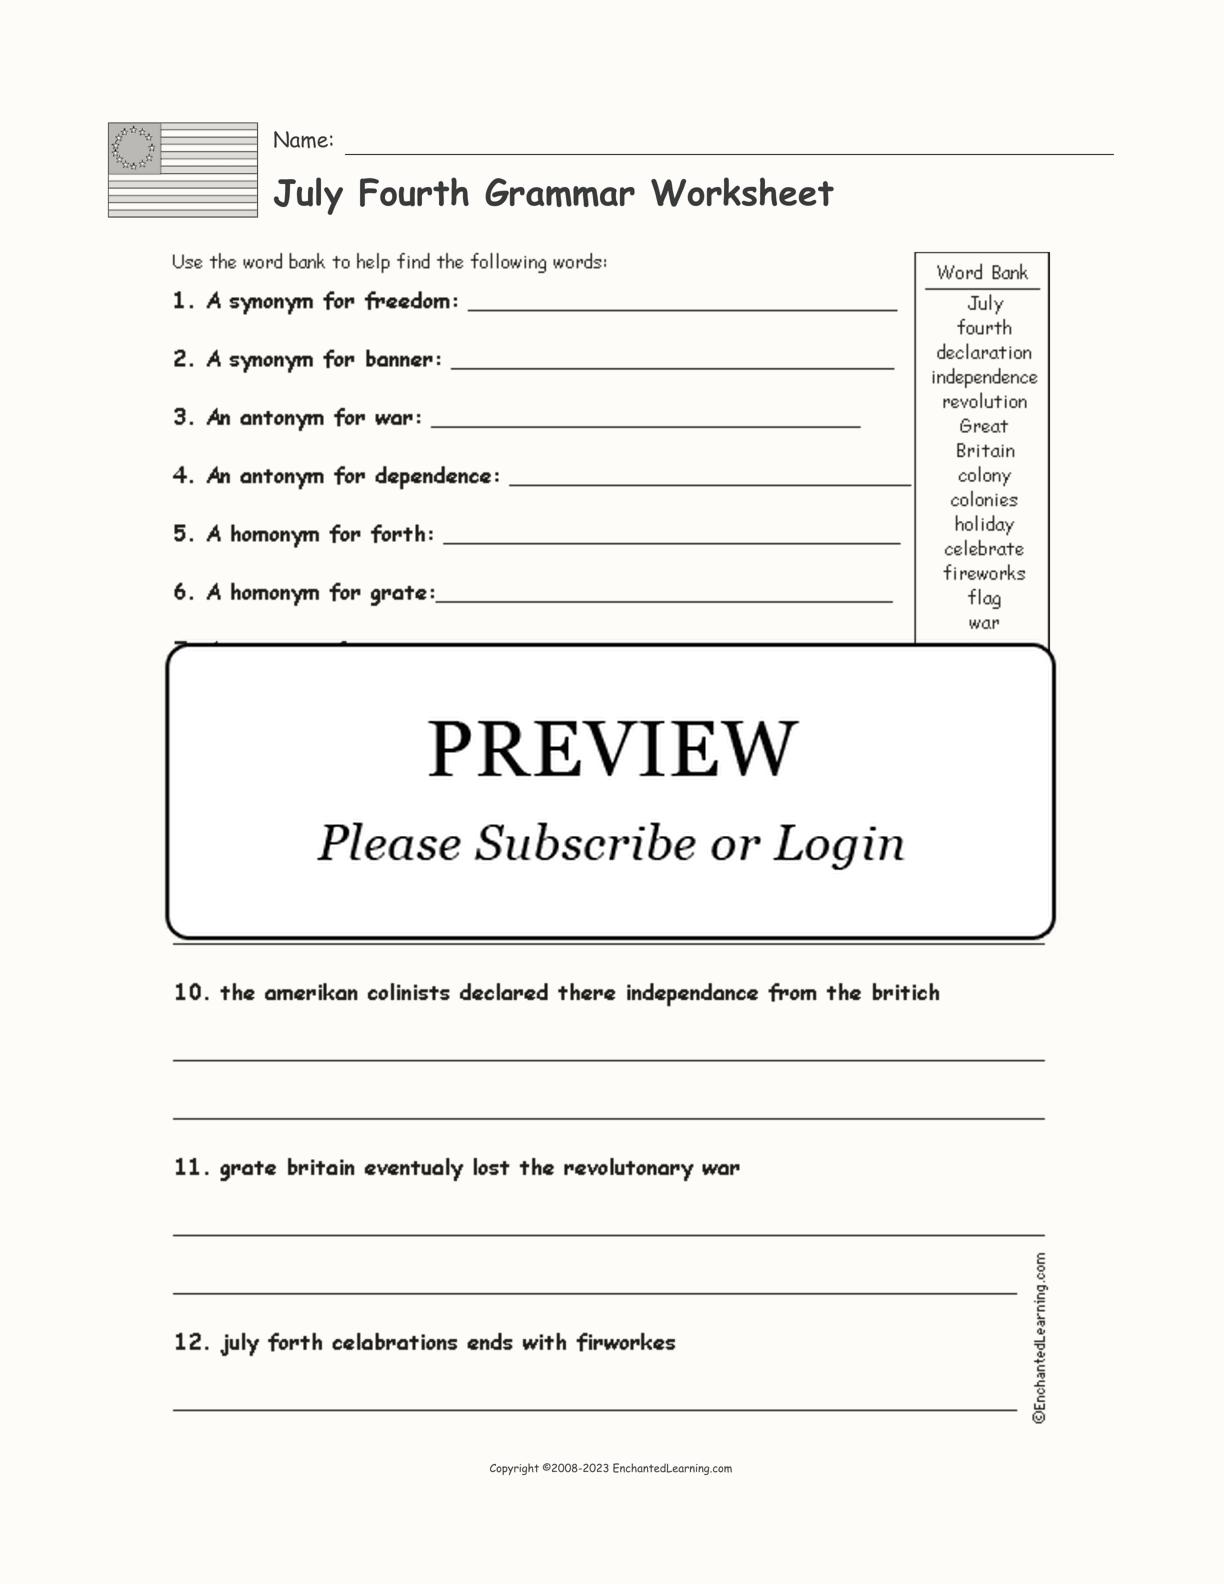 July 4th Grammar Worksheet